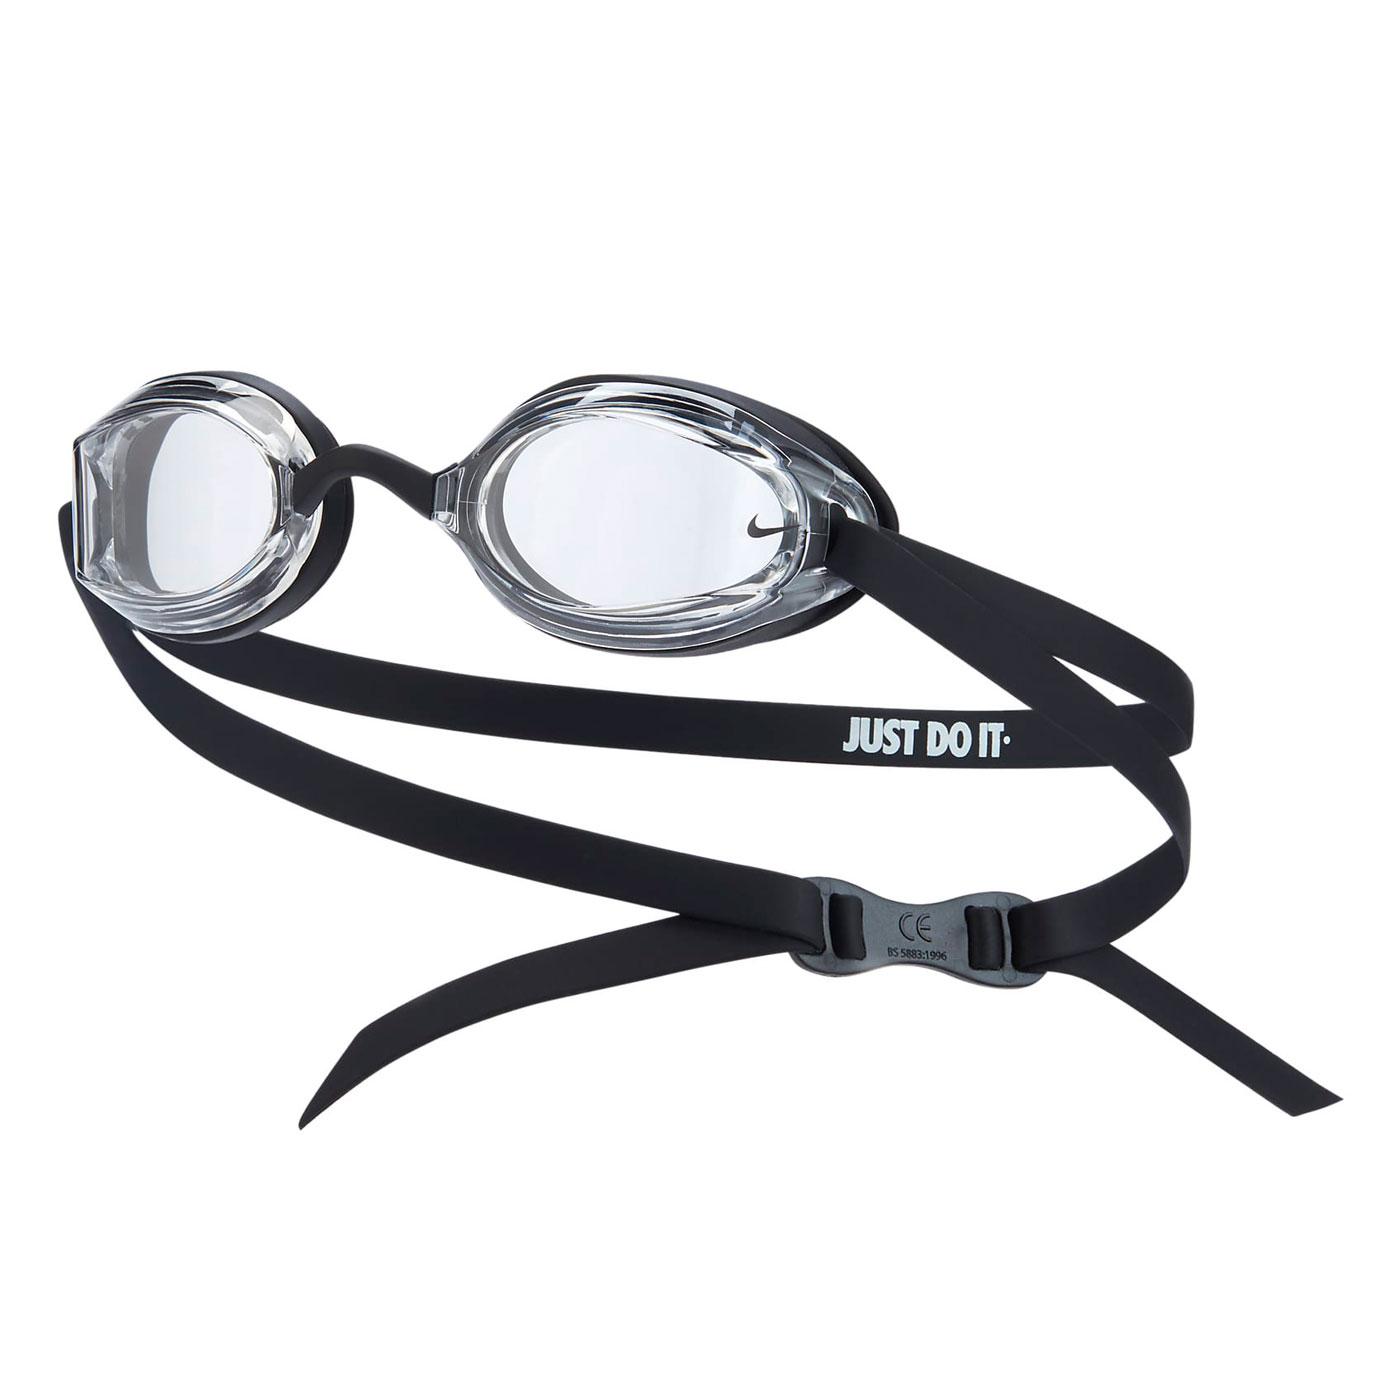 NIKE SWIM 成人專業型泳鏡 NESSA179-006